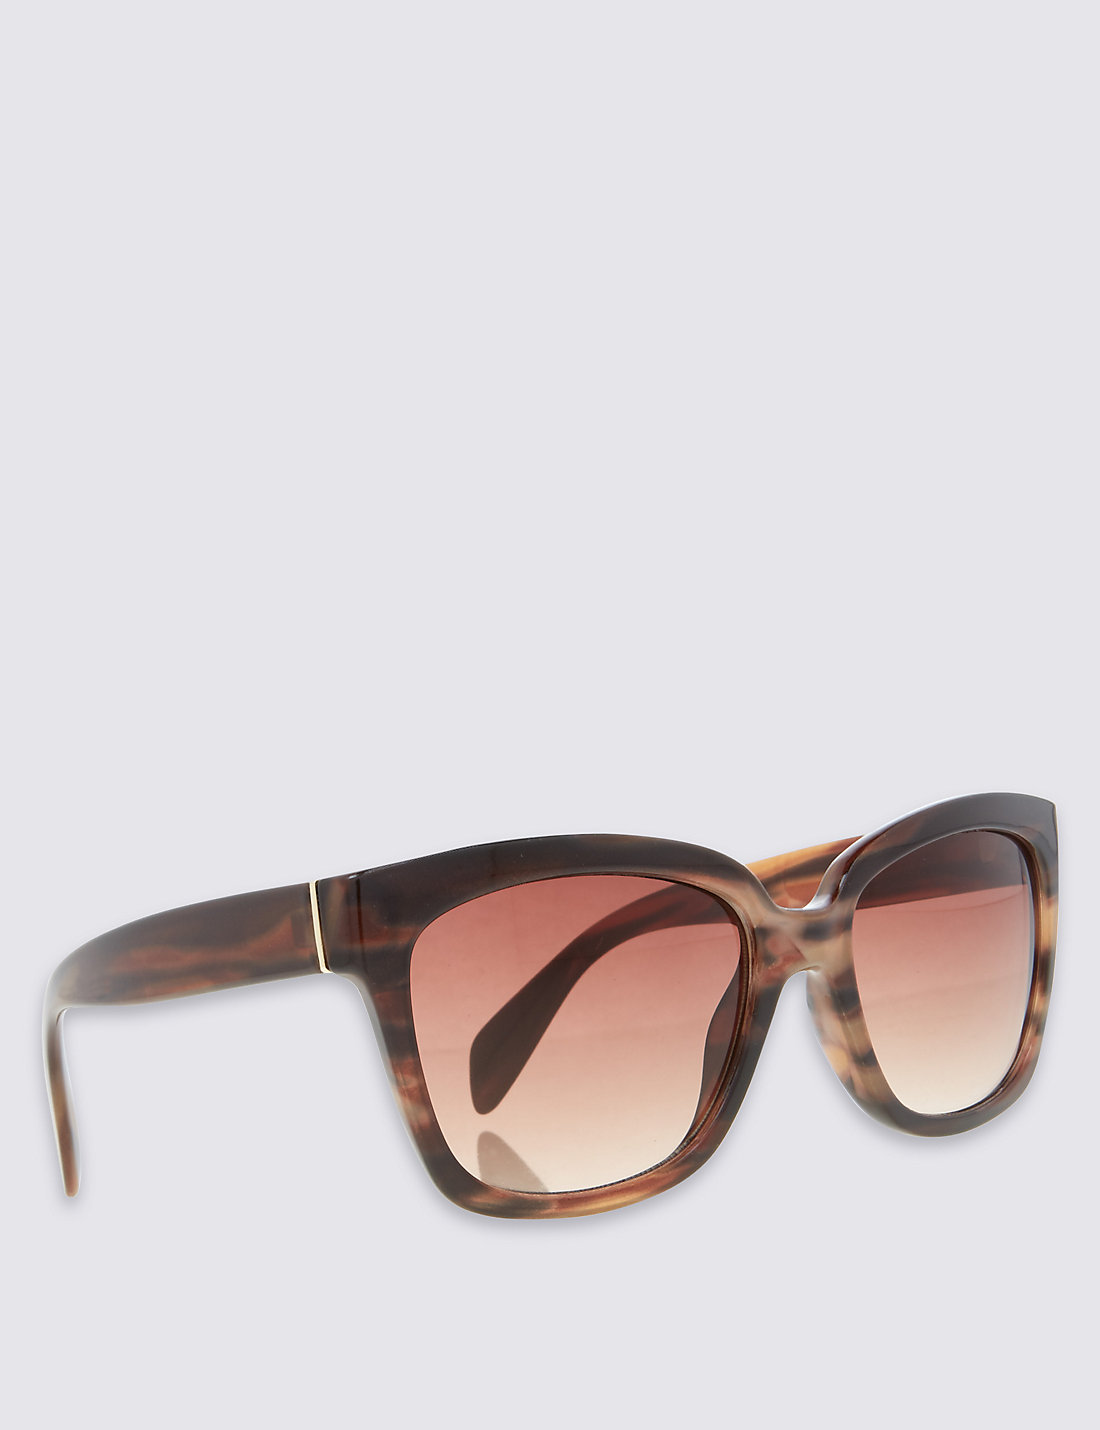 popular womens sunglasses  popular womens sunglasses